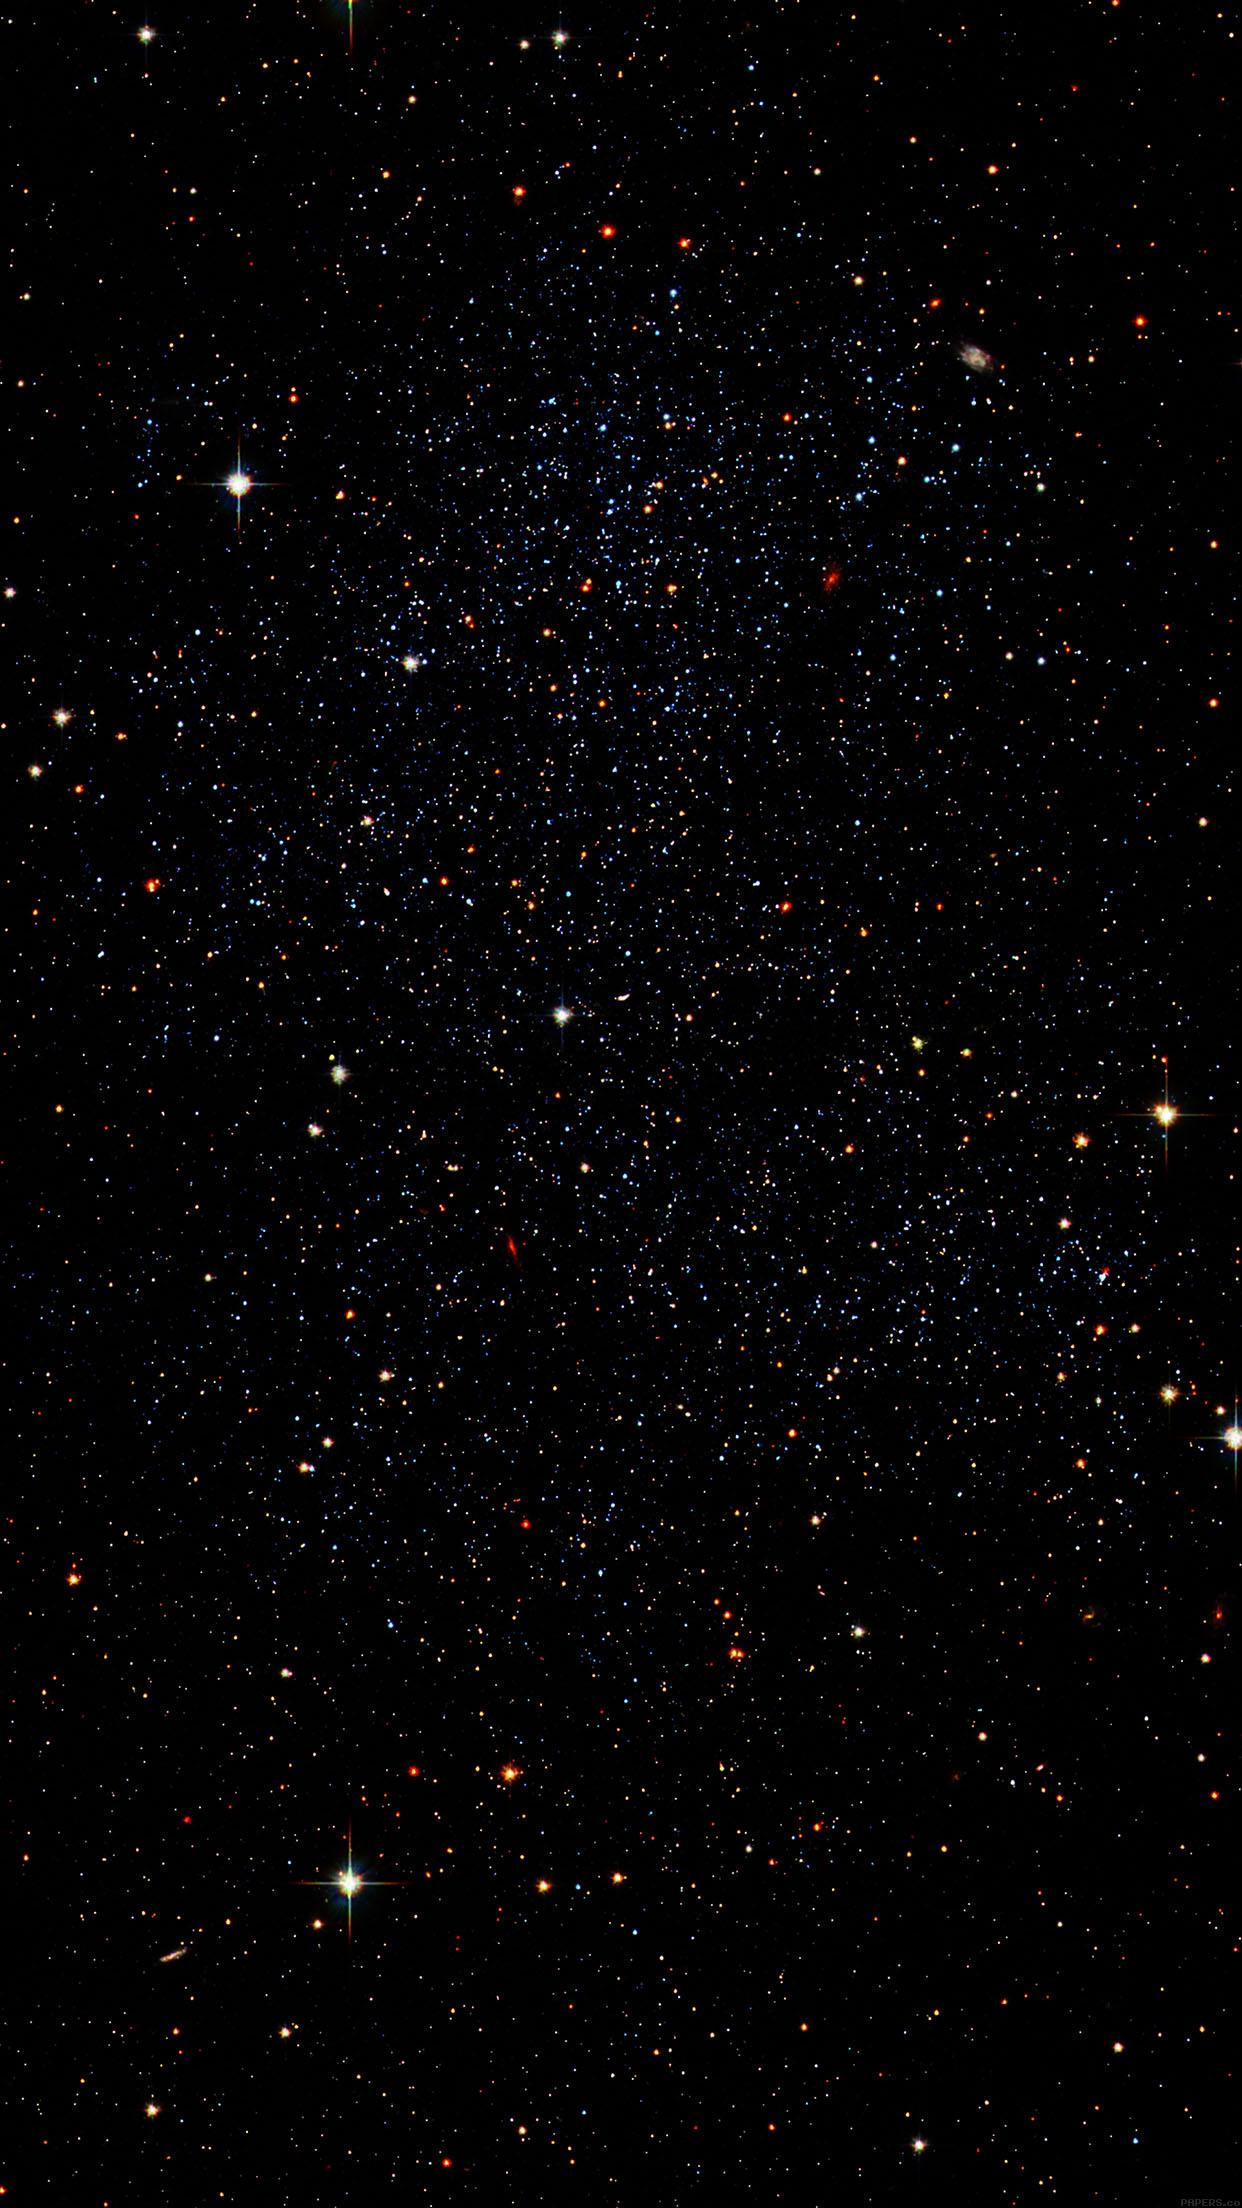 Iphonepapers Md03 Wallpaper Night Space Night Sagittarius